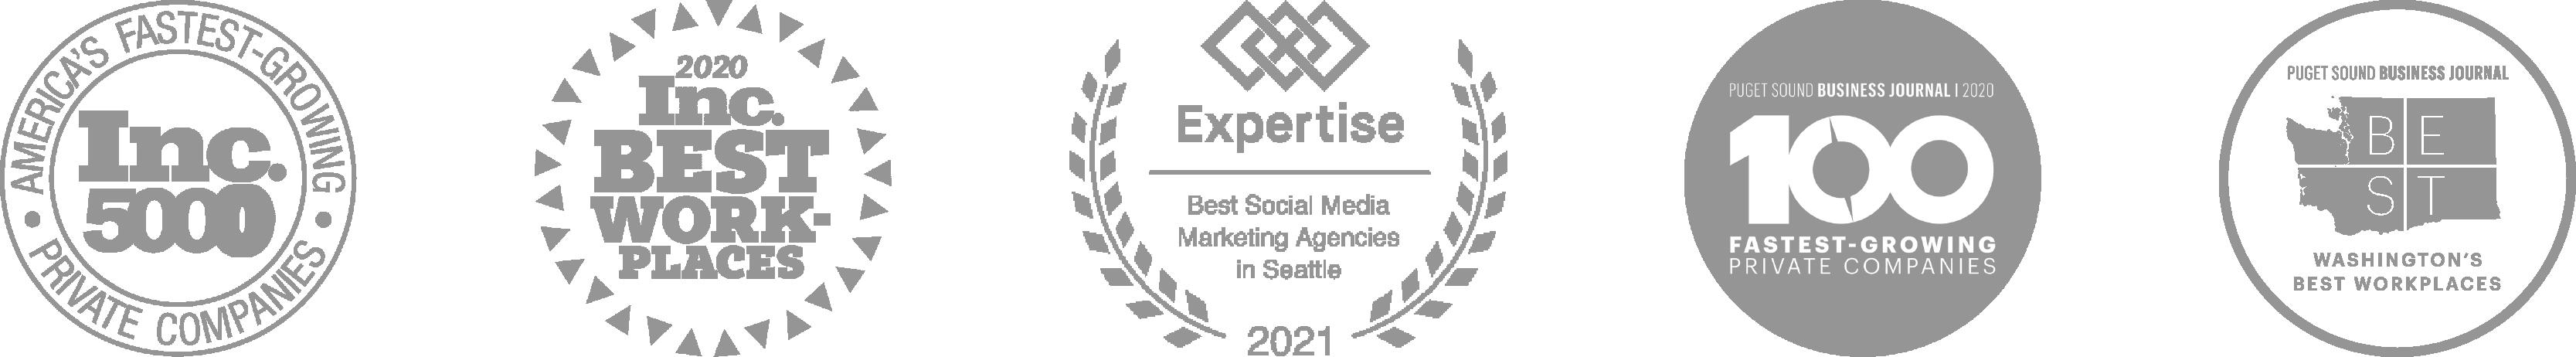 Awards Inc5000, IncBest Work Places, Expertise, 100 Fatest Growing, Best Washington Workplaces